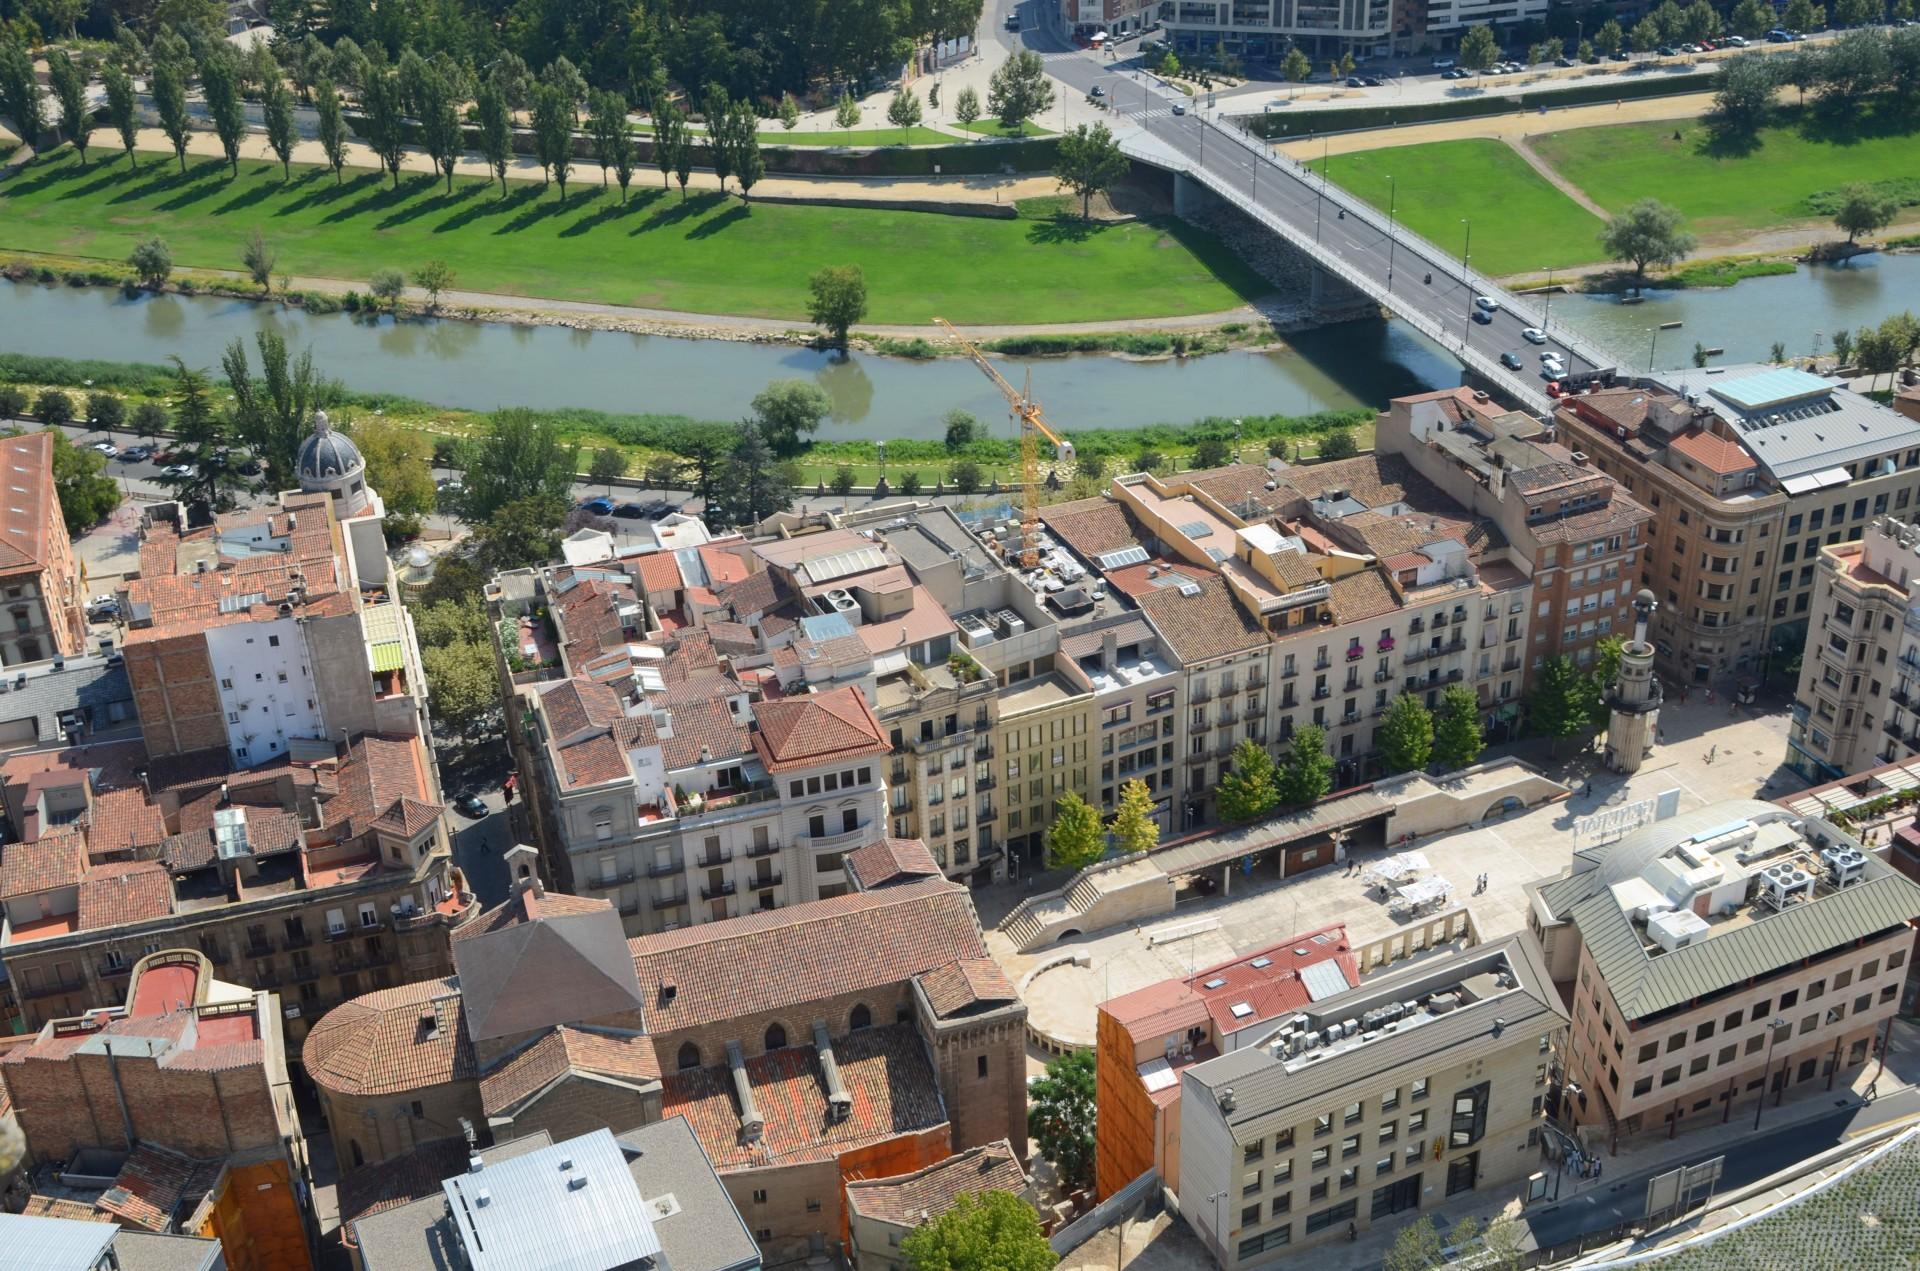 Spain,travel,lleida,lerida,catalonia - free image from needpix.com